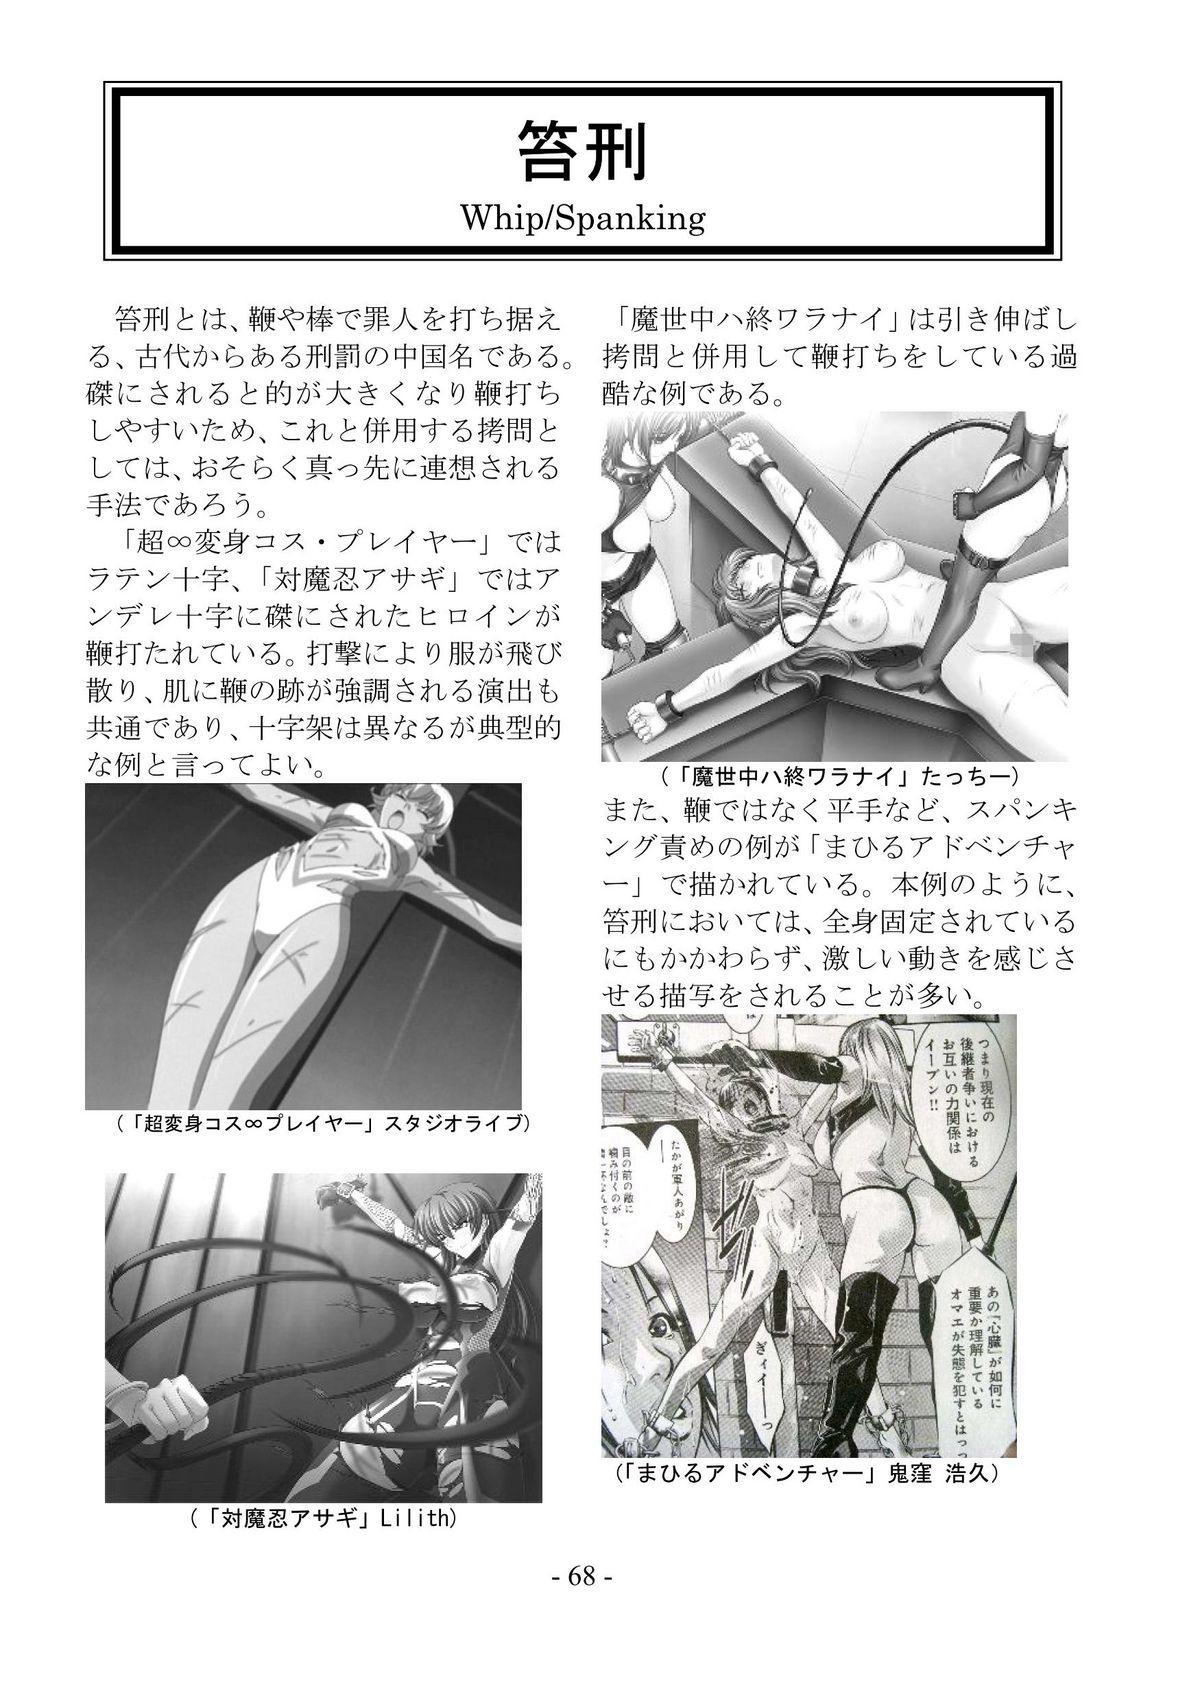 encyclopedia of crucifixion 68